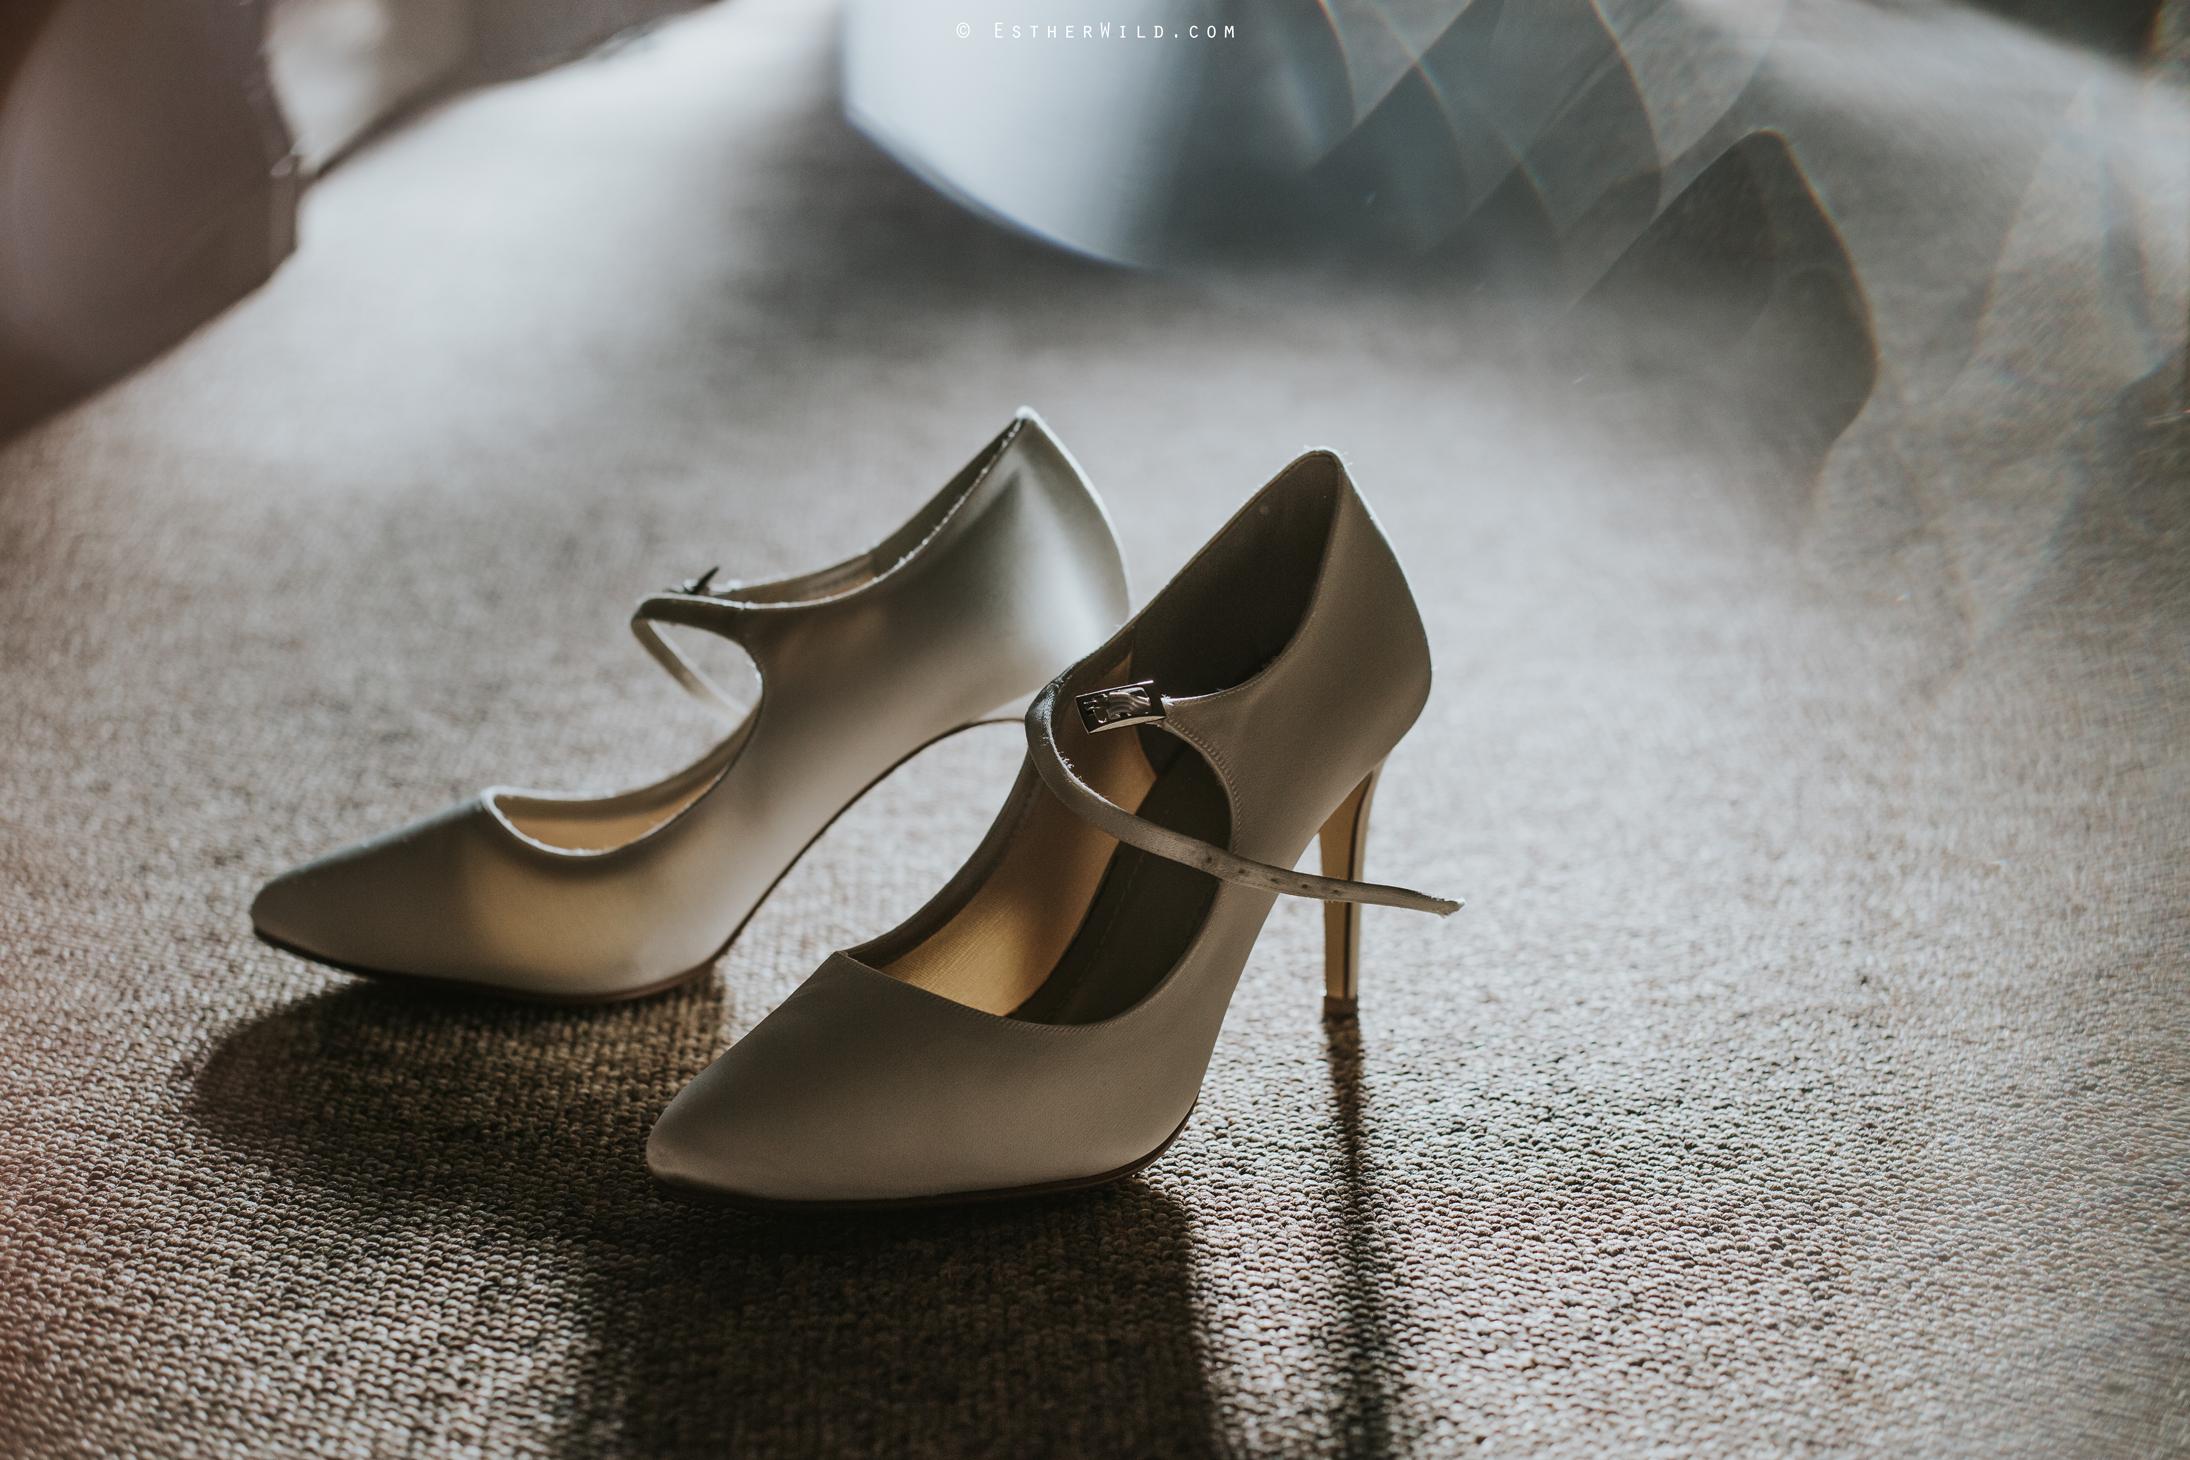 Wedding_Kings_Lynn_Town_Hall_Norfolk_Photographer_Esther_Wild_IMG_0107_IMGL0137.jpg